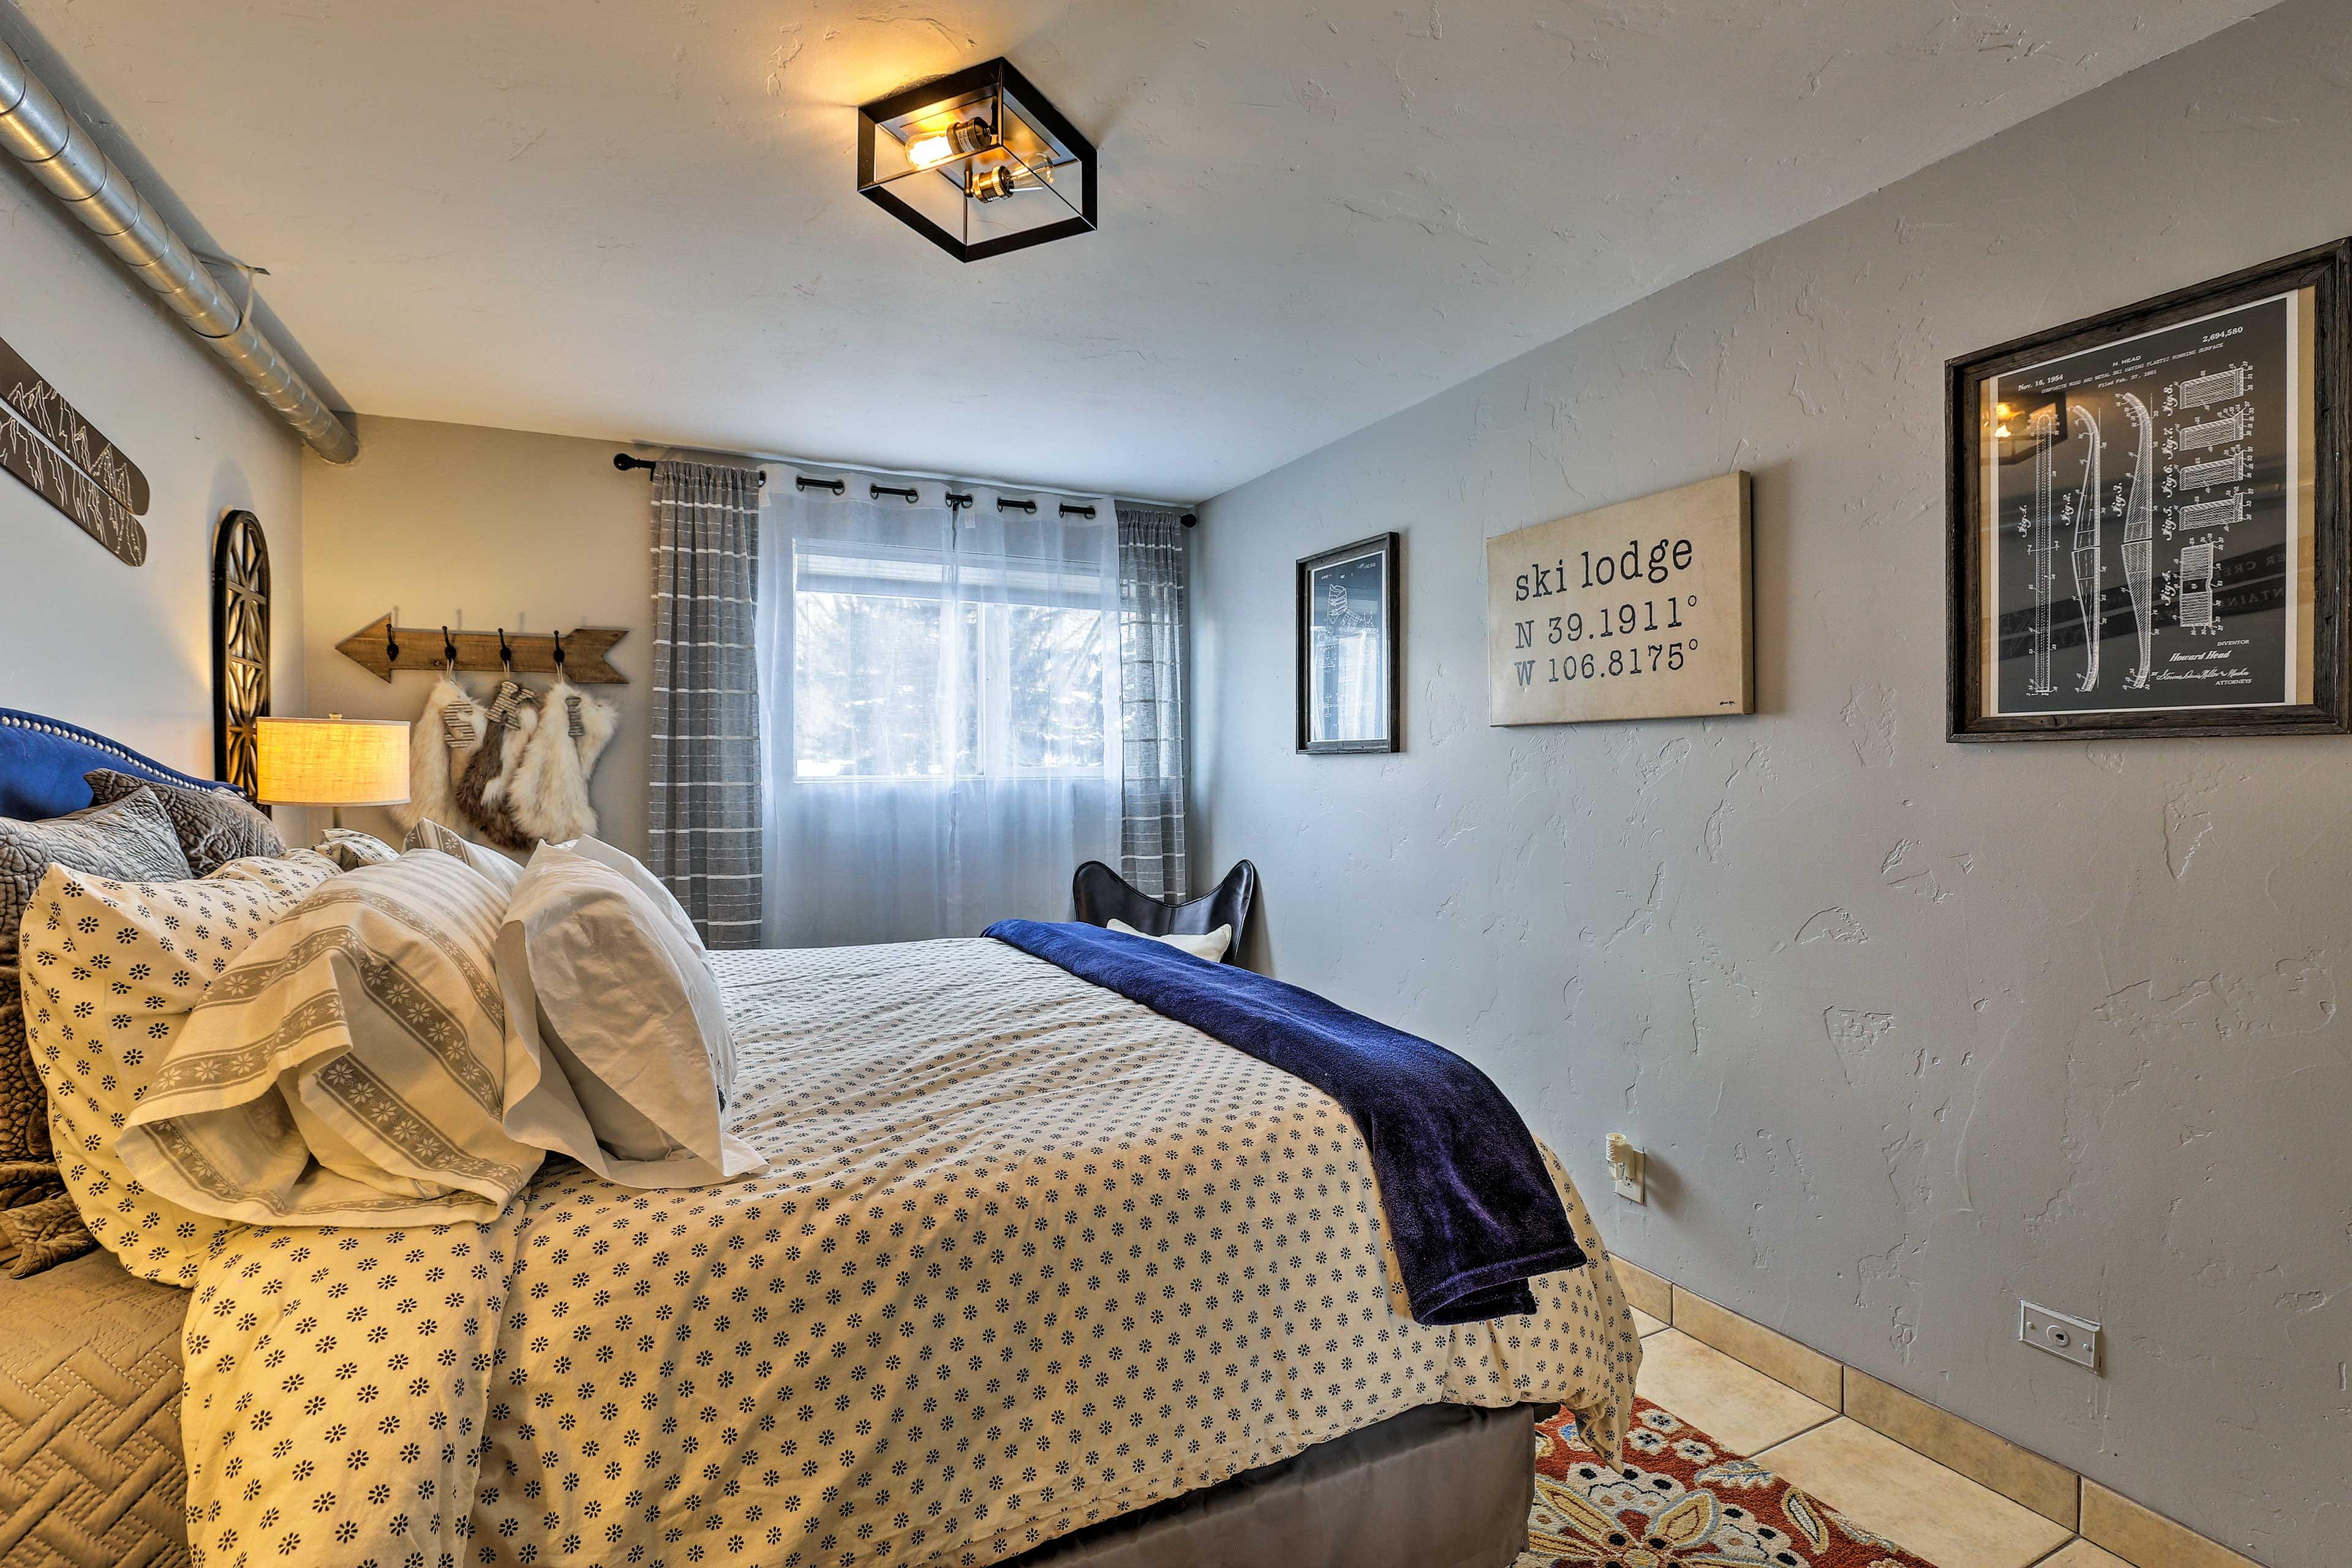 Mountain-themed decor creates a cozy, warm room.